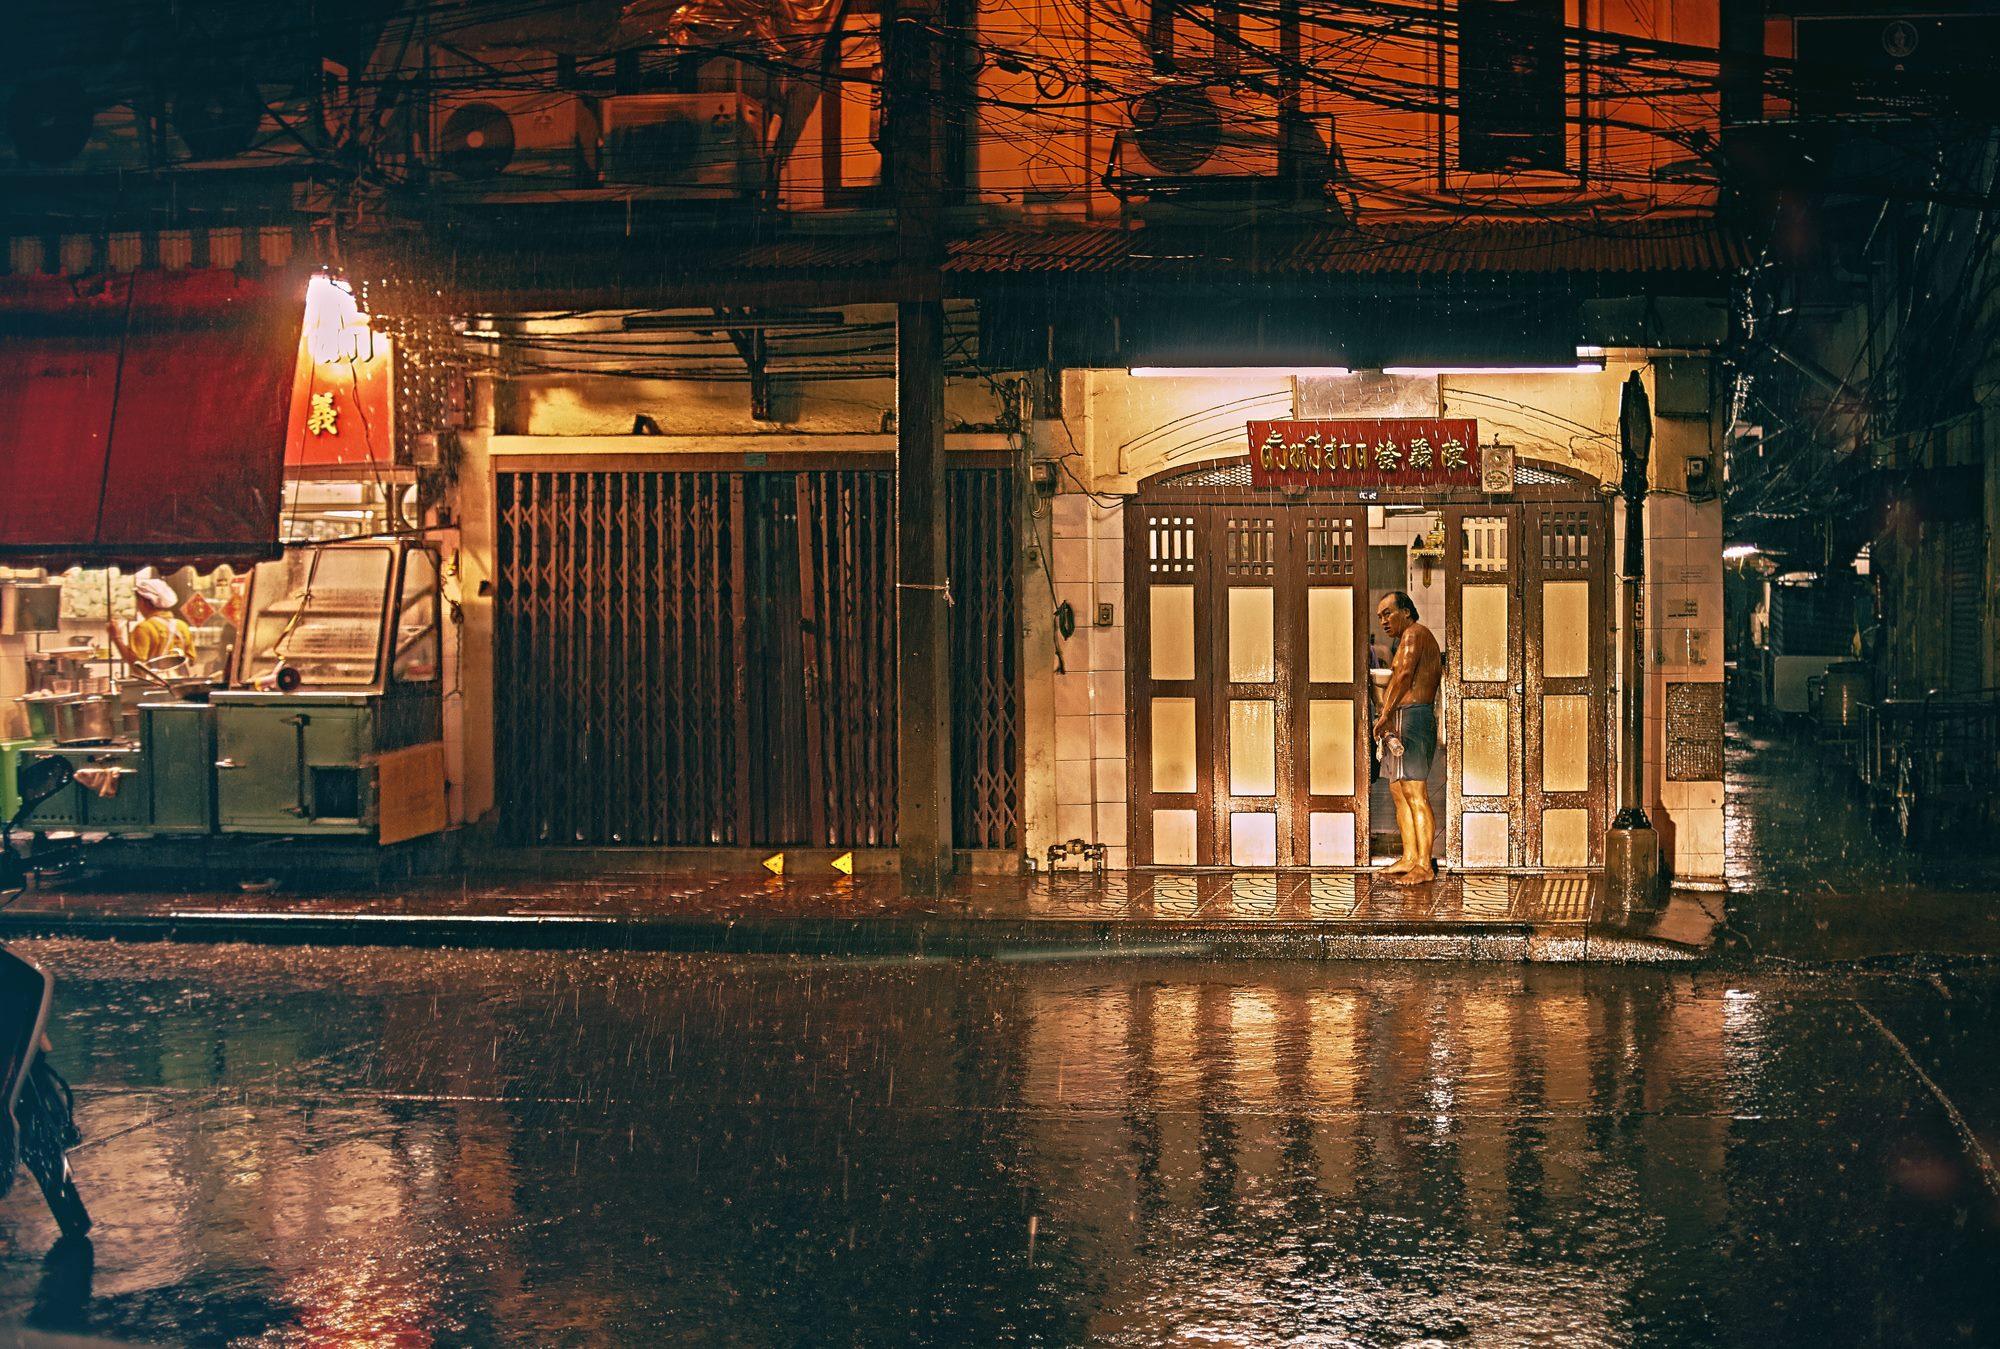 Pouring rain Chinatown in Bangkok.